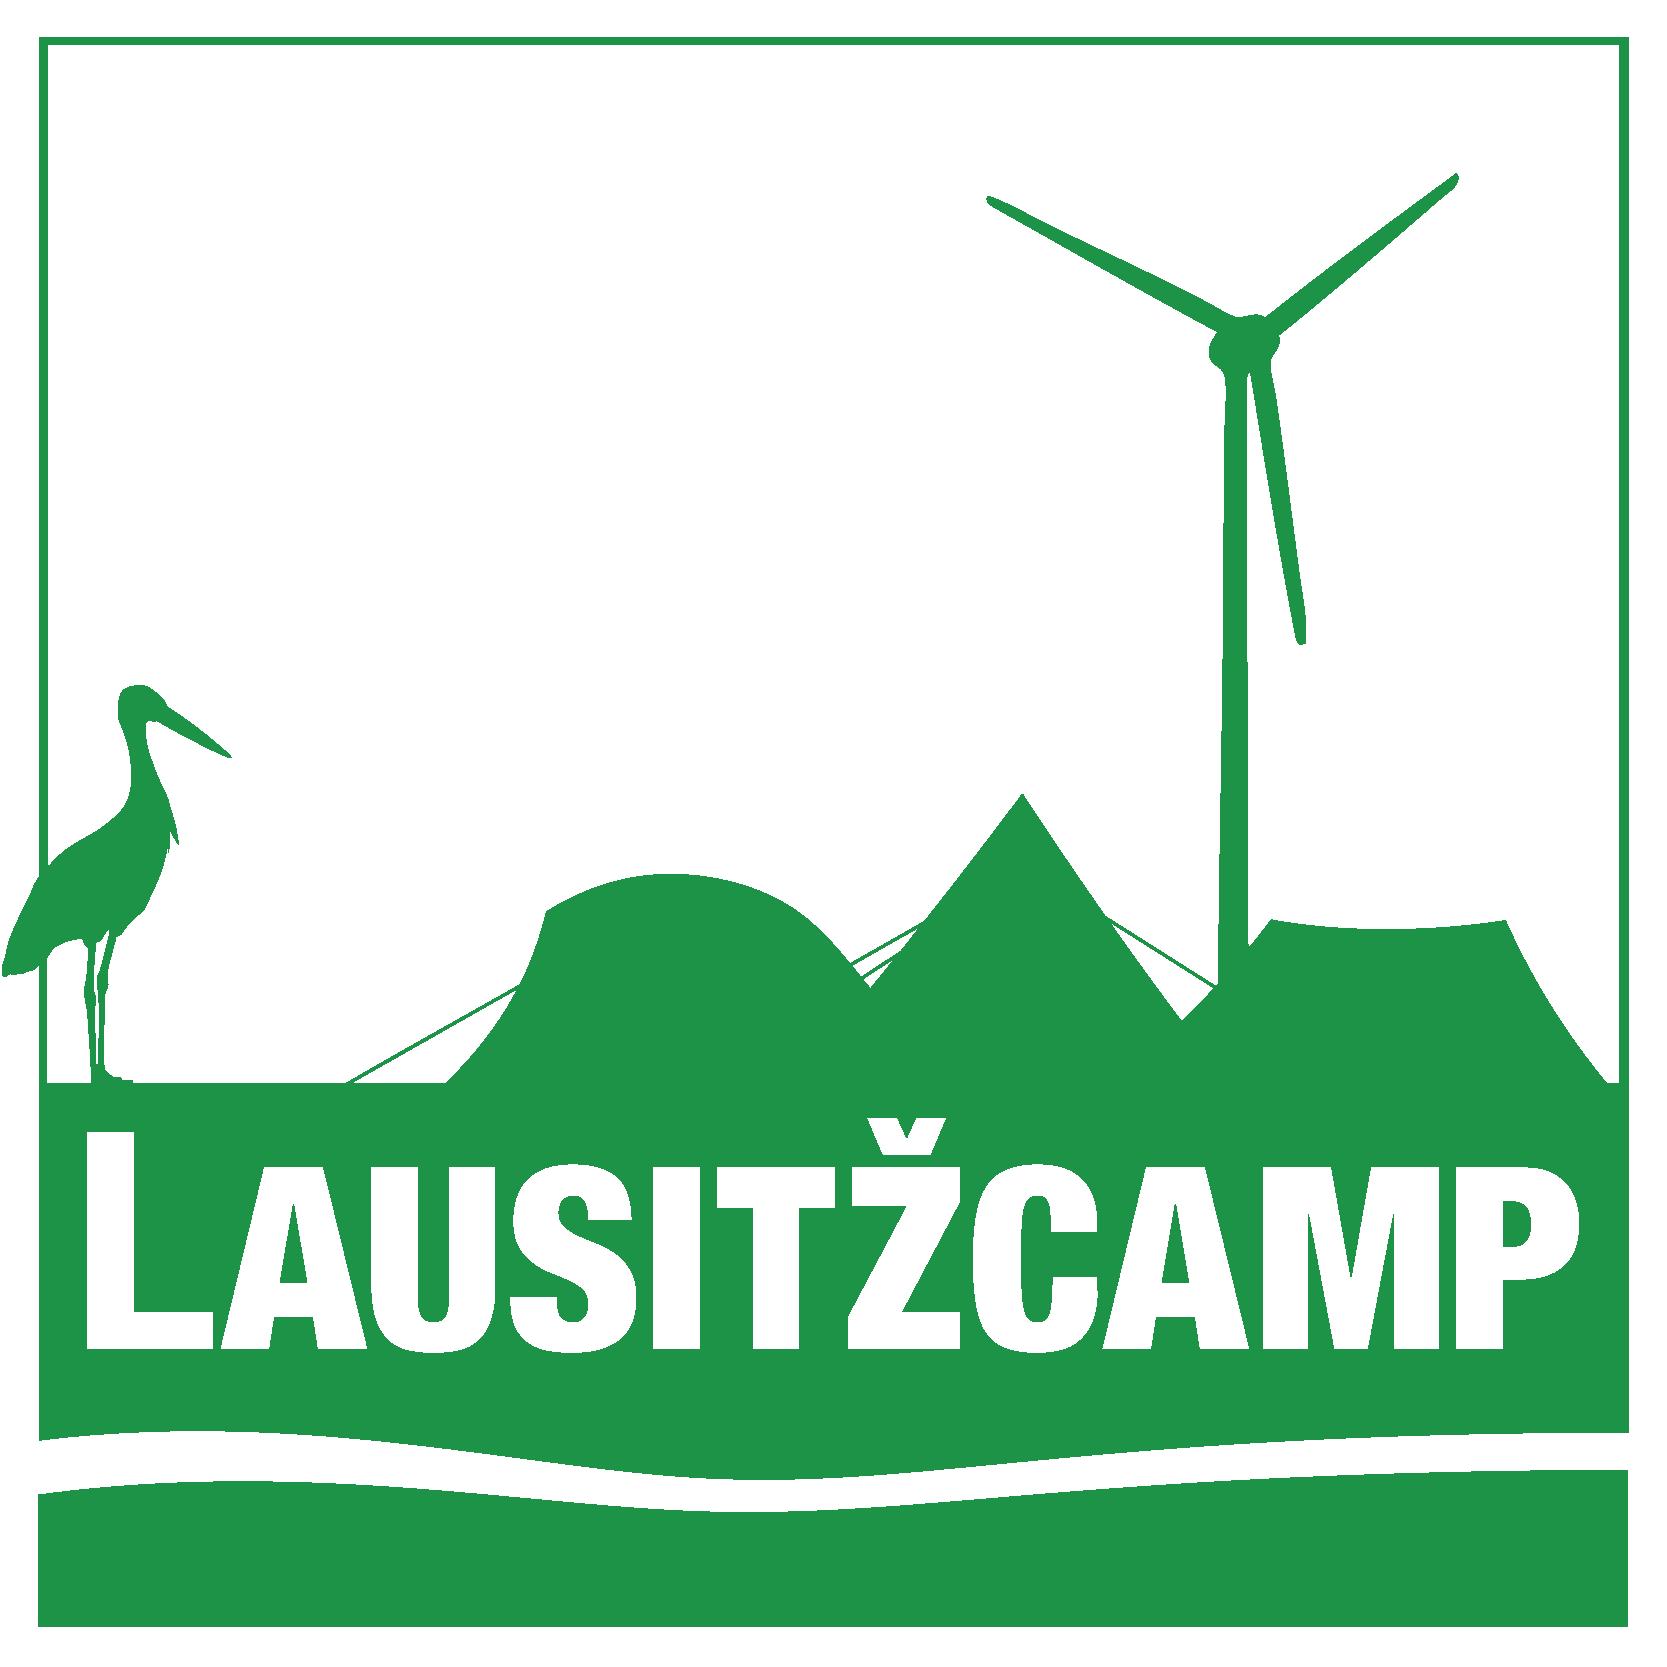 Lausitzcamp